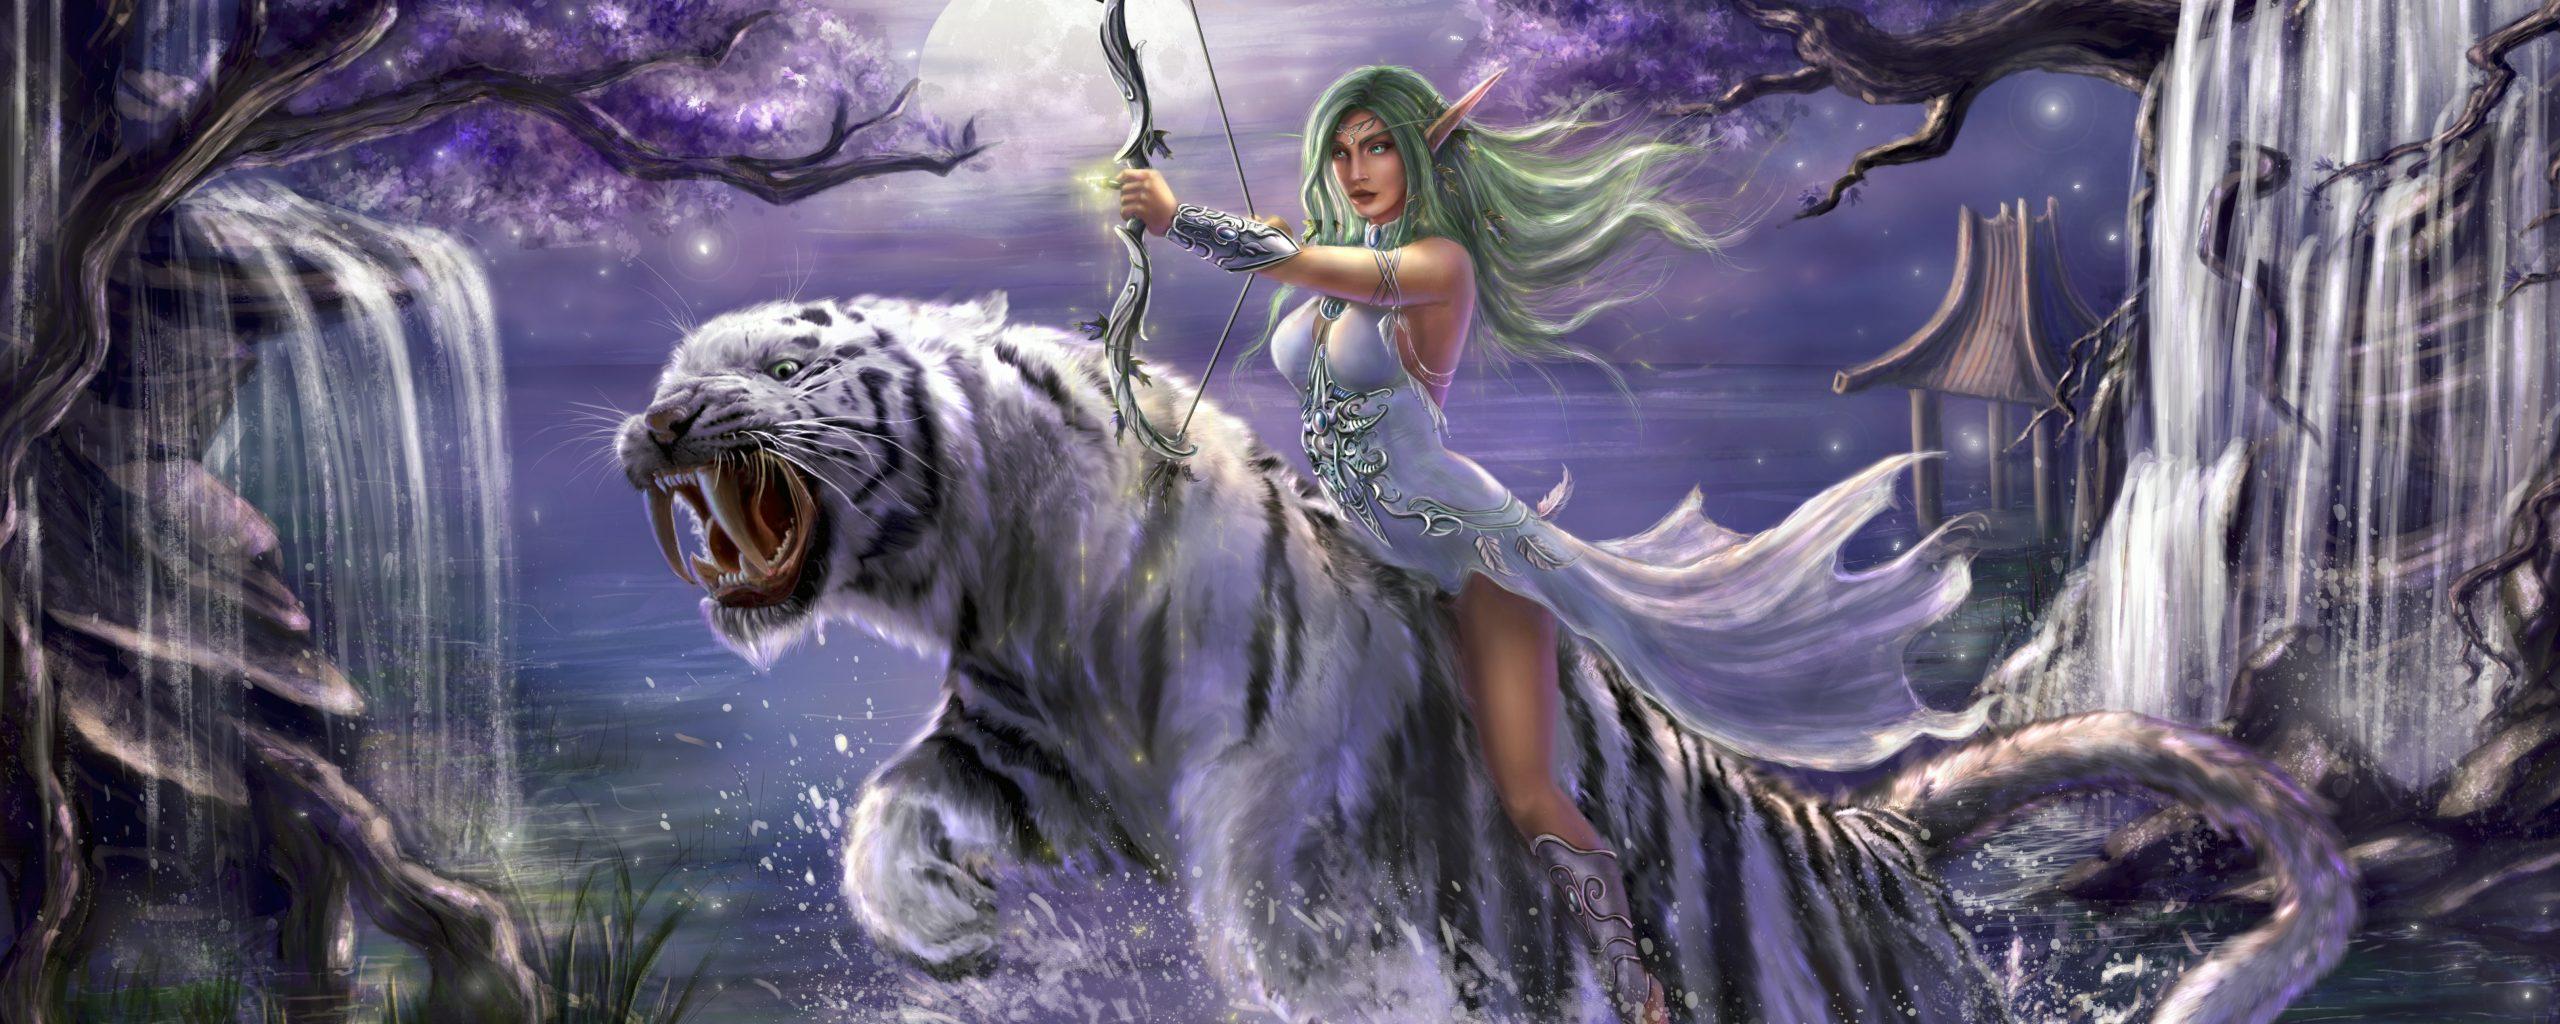 Dual Monitor Girl Wallpaper Tyrande Whisperwind World Of Warcraft 5k Wallpaper Best